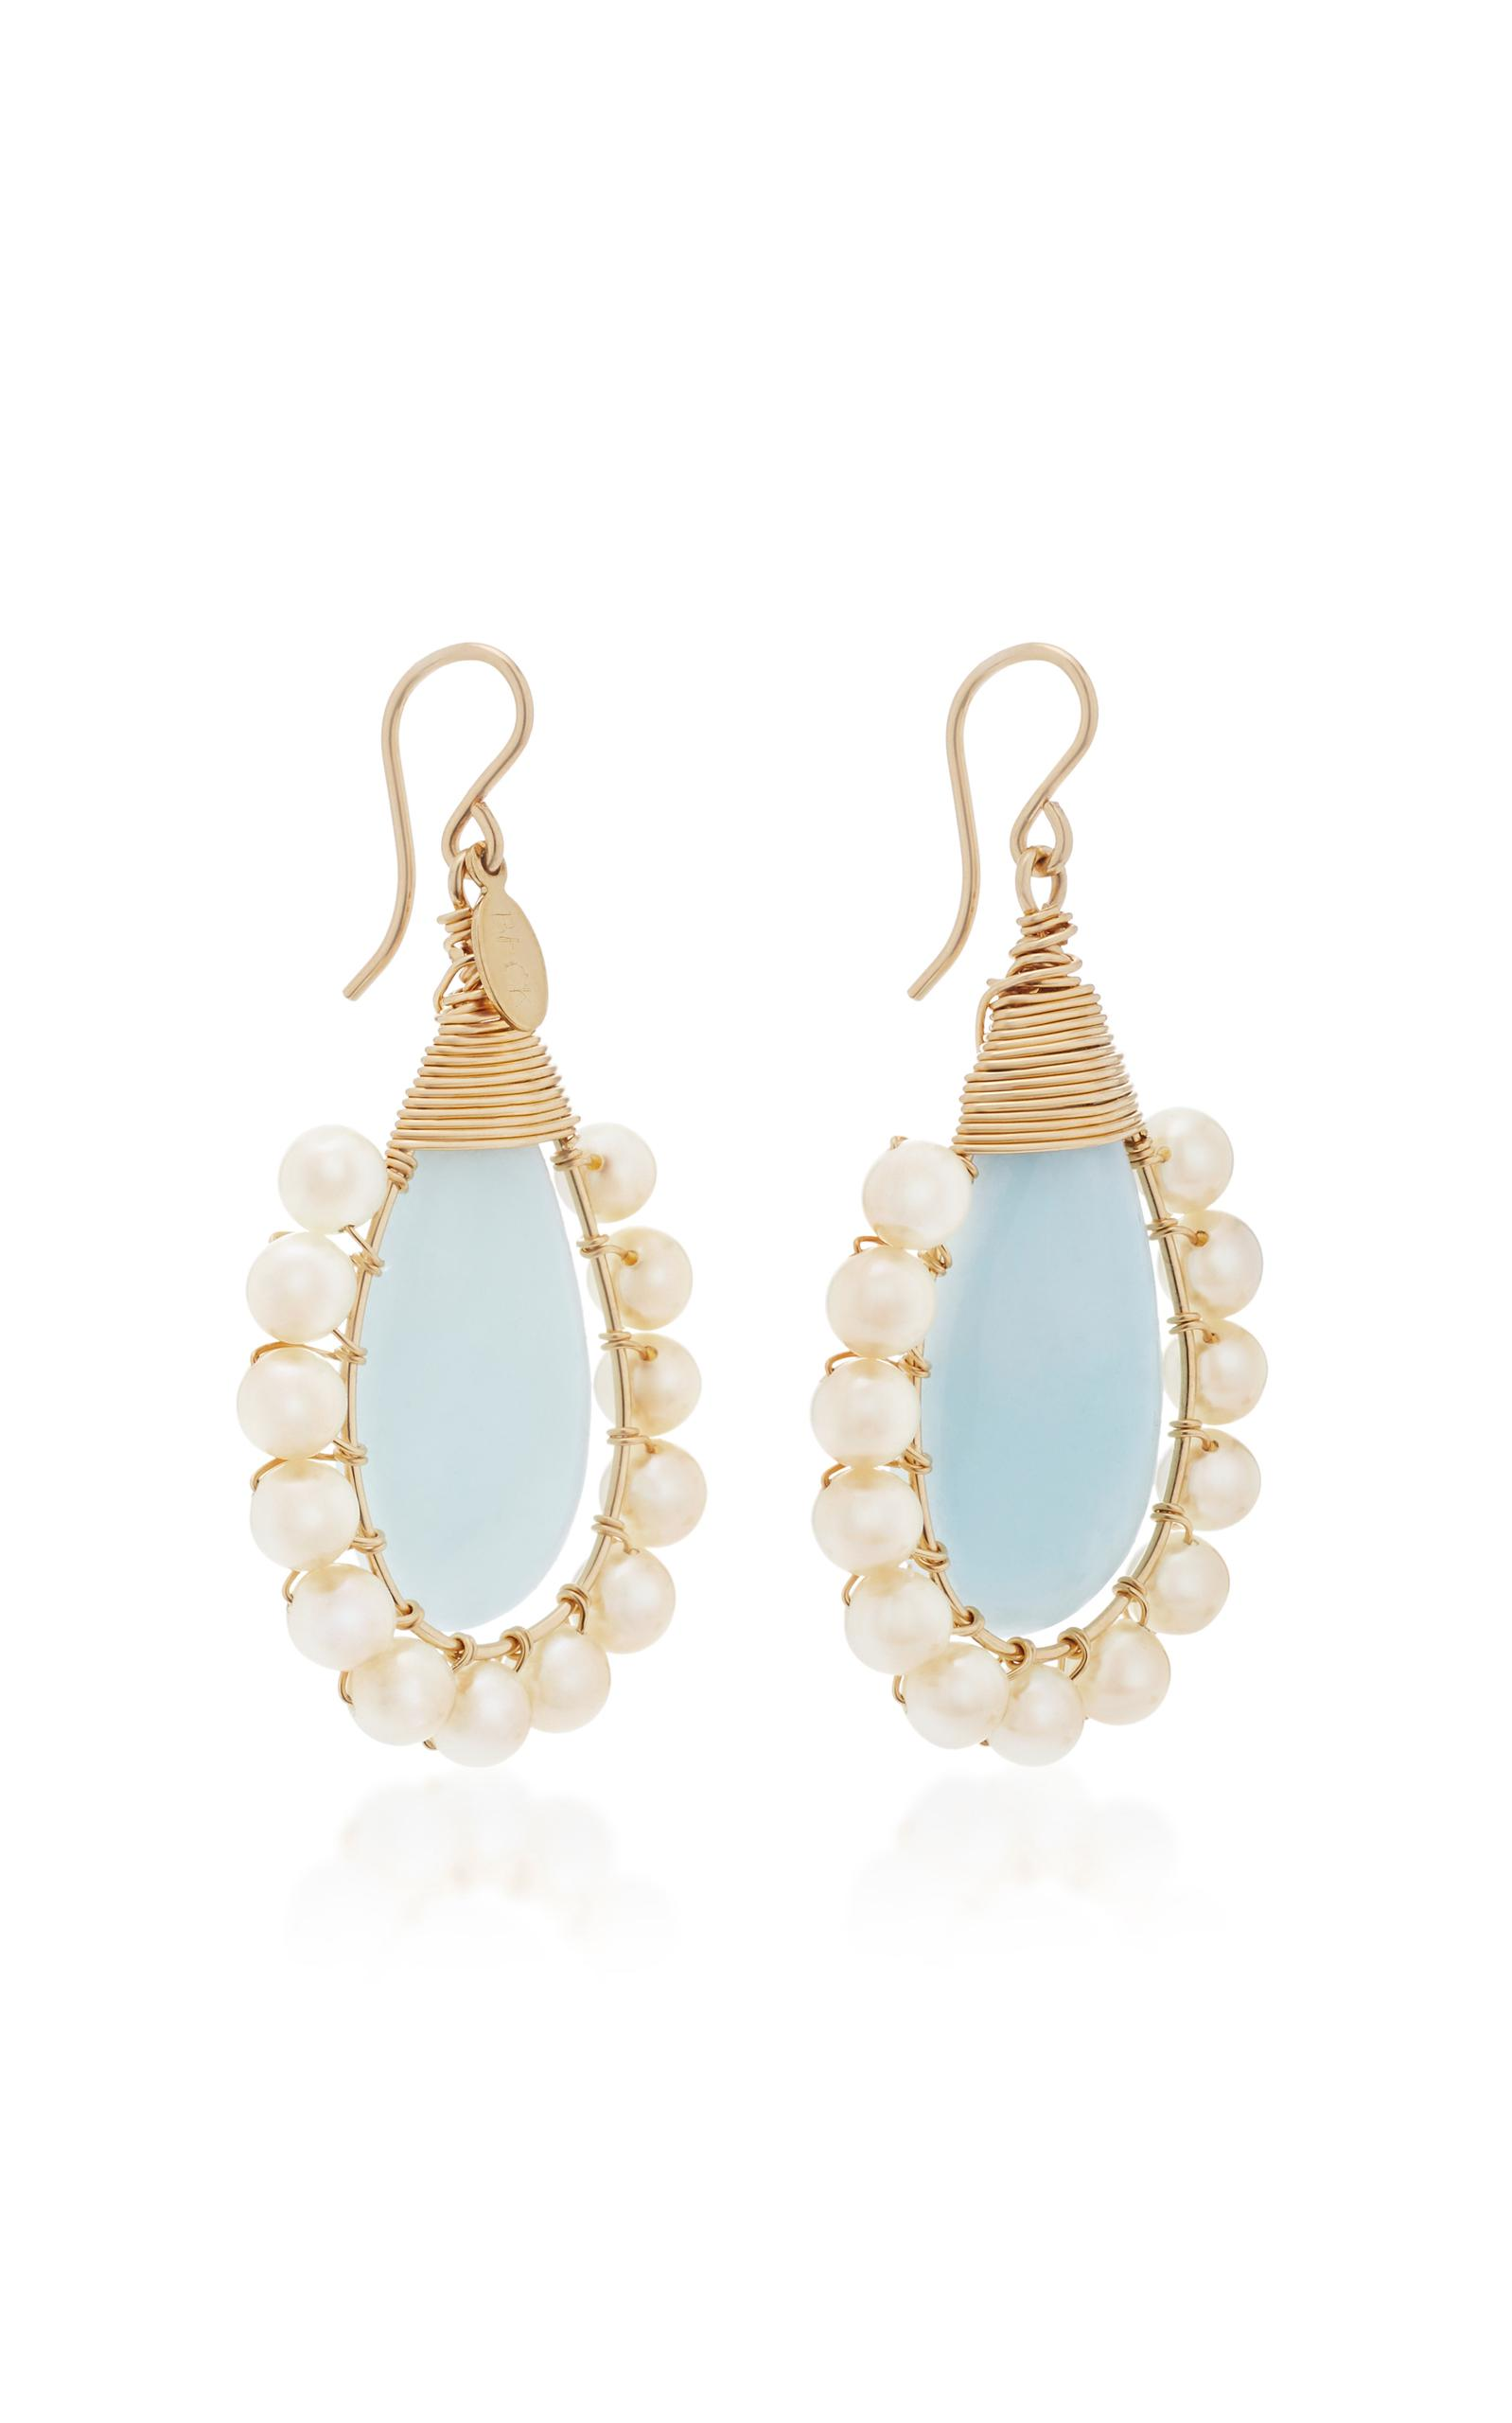 Rose Lolita Gold-Filled Rose Quartz and Pearl Earrings Beck Jewels xSKgtN